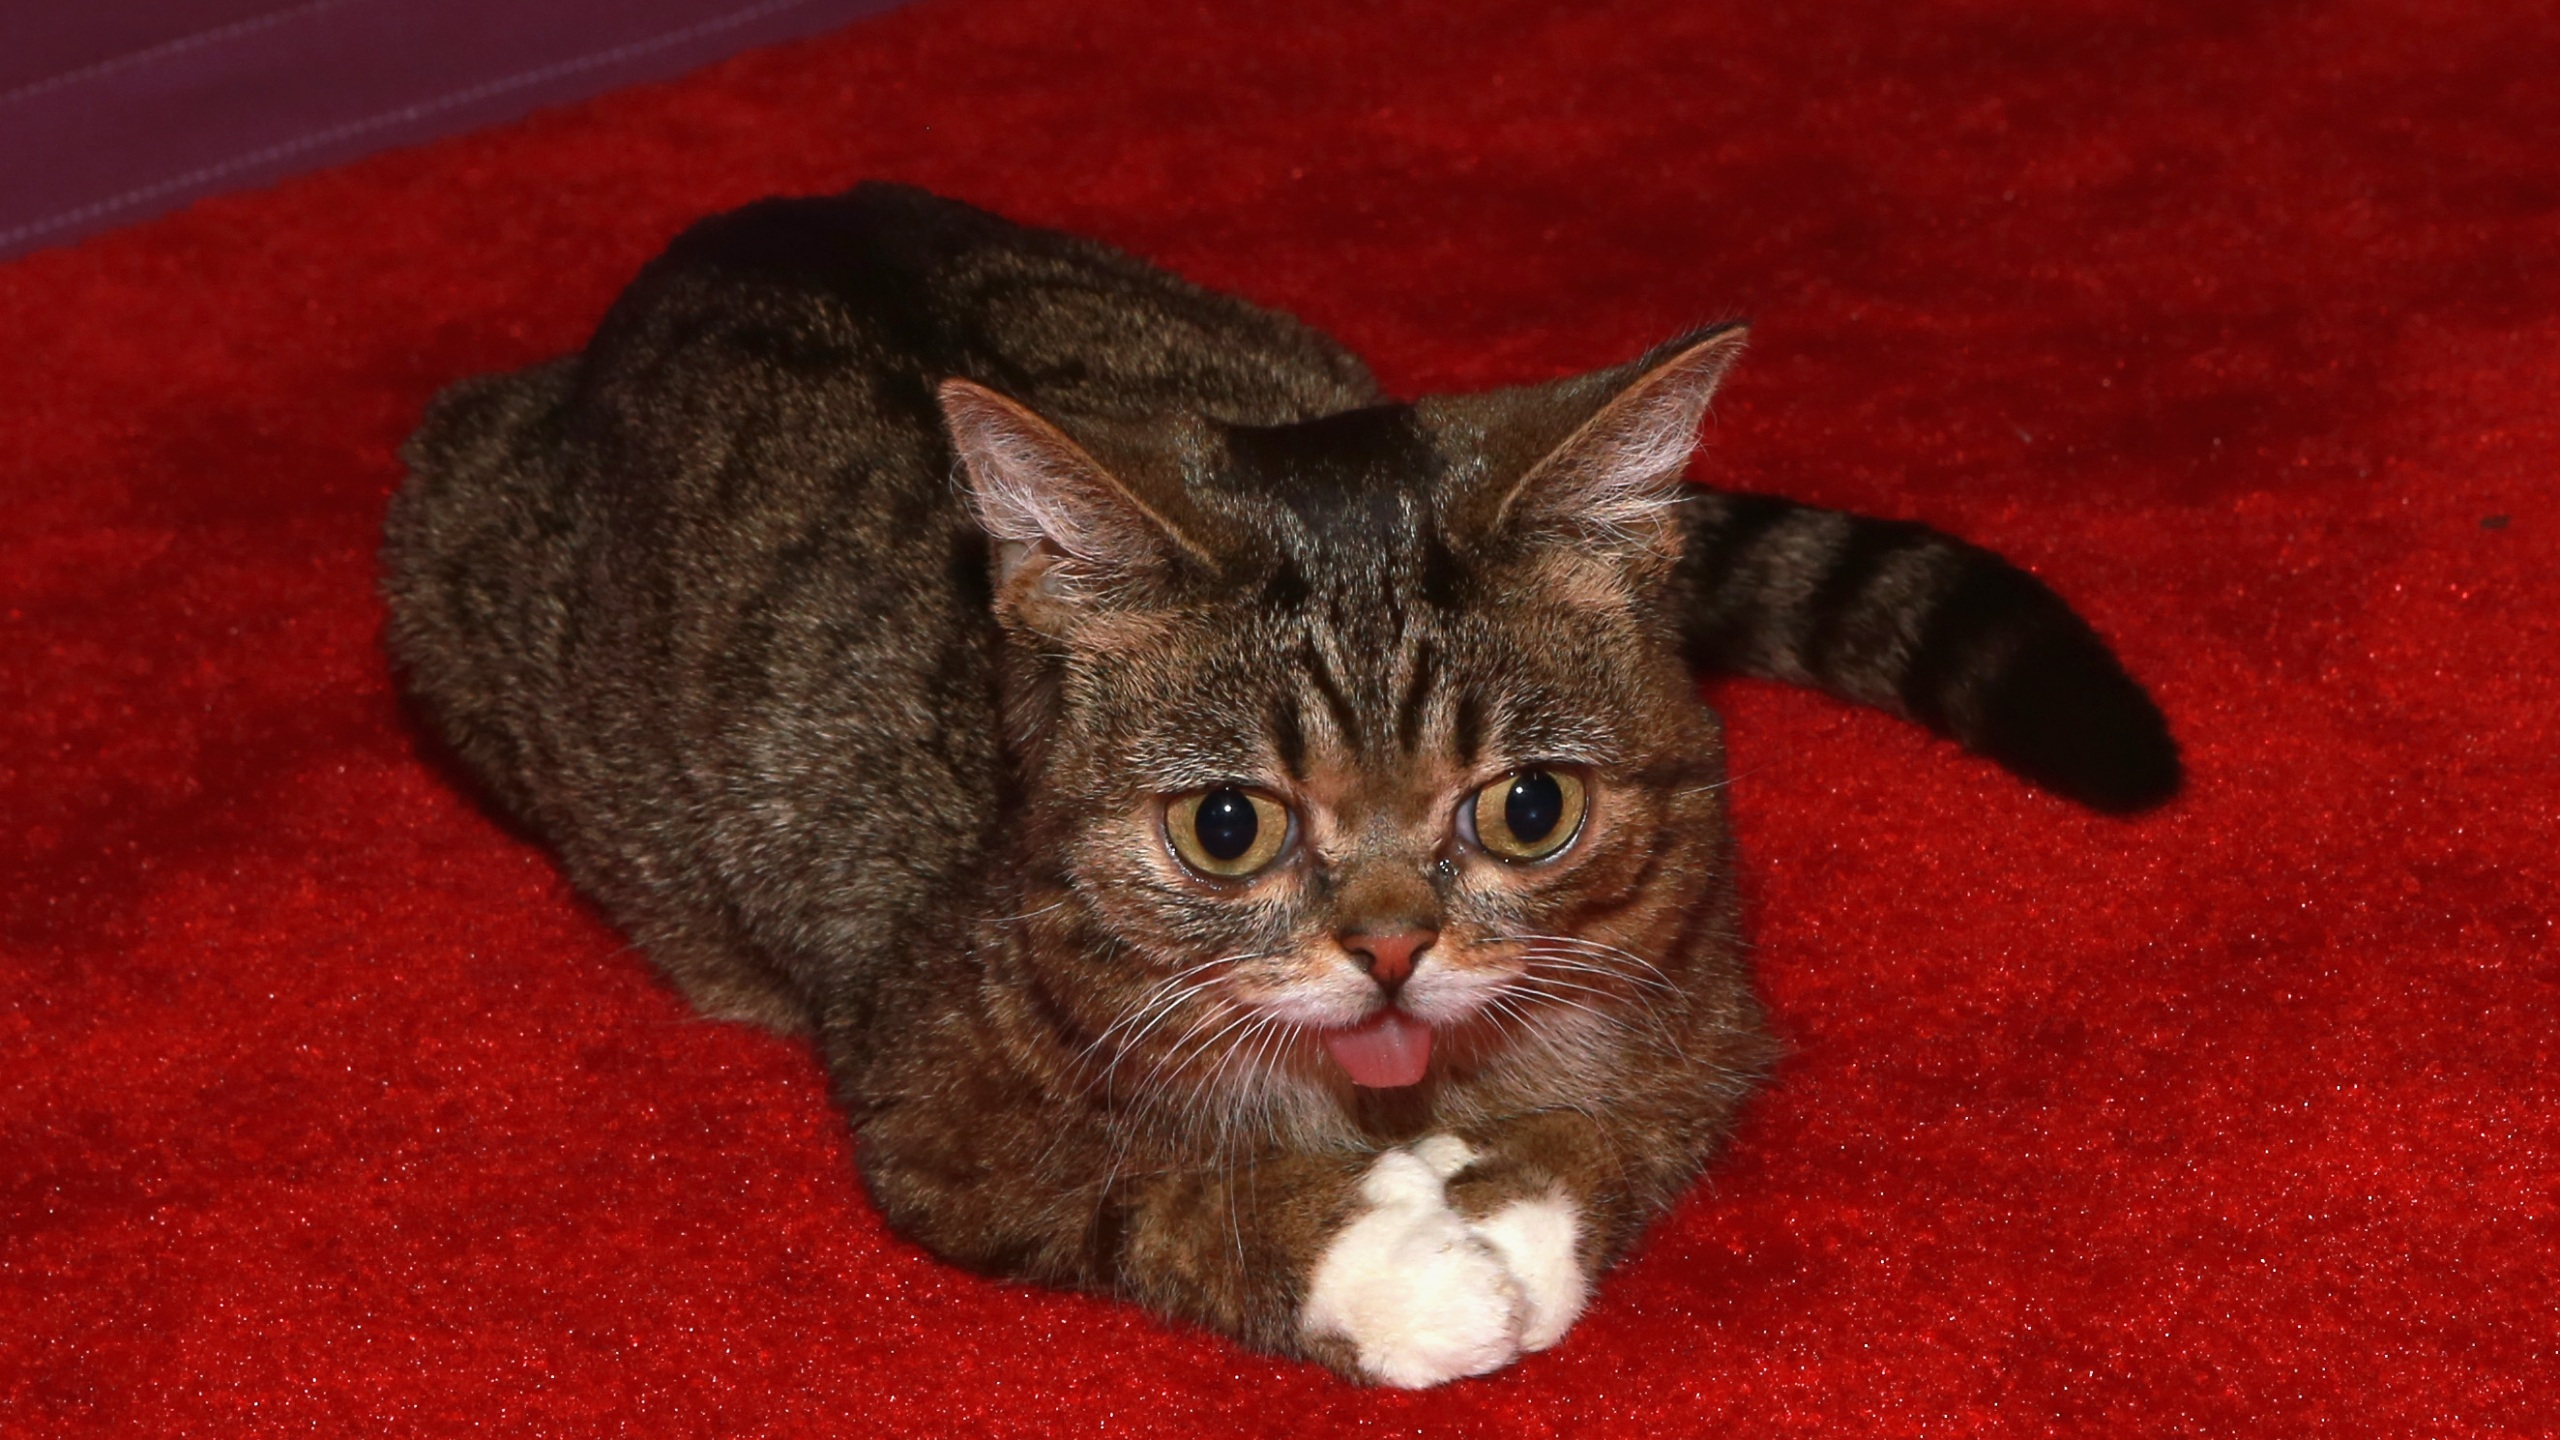 Lil Bub, Internet-famous cat, dies at 8